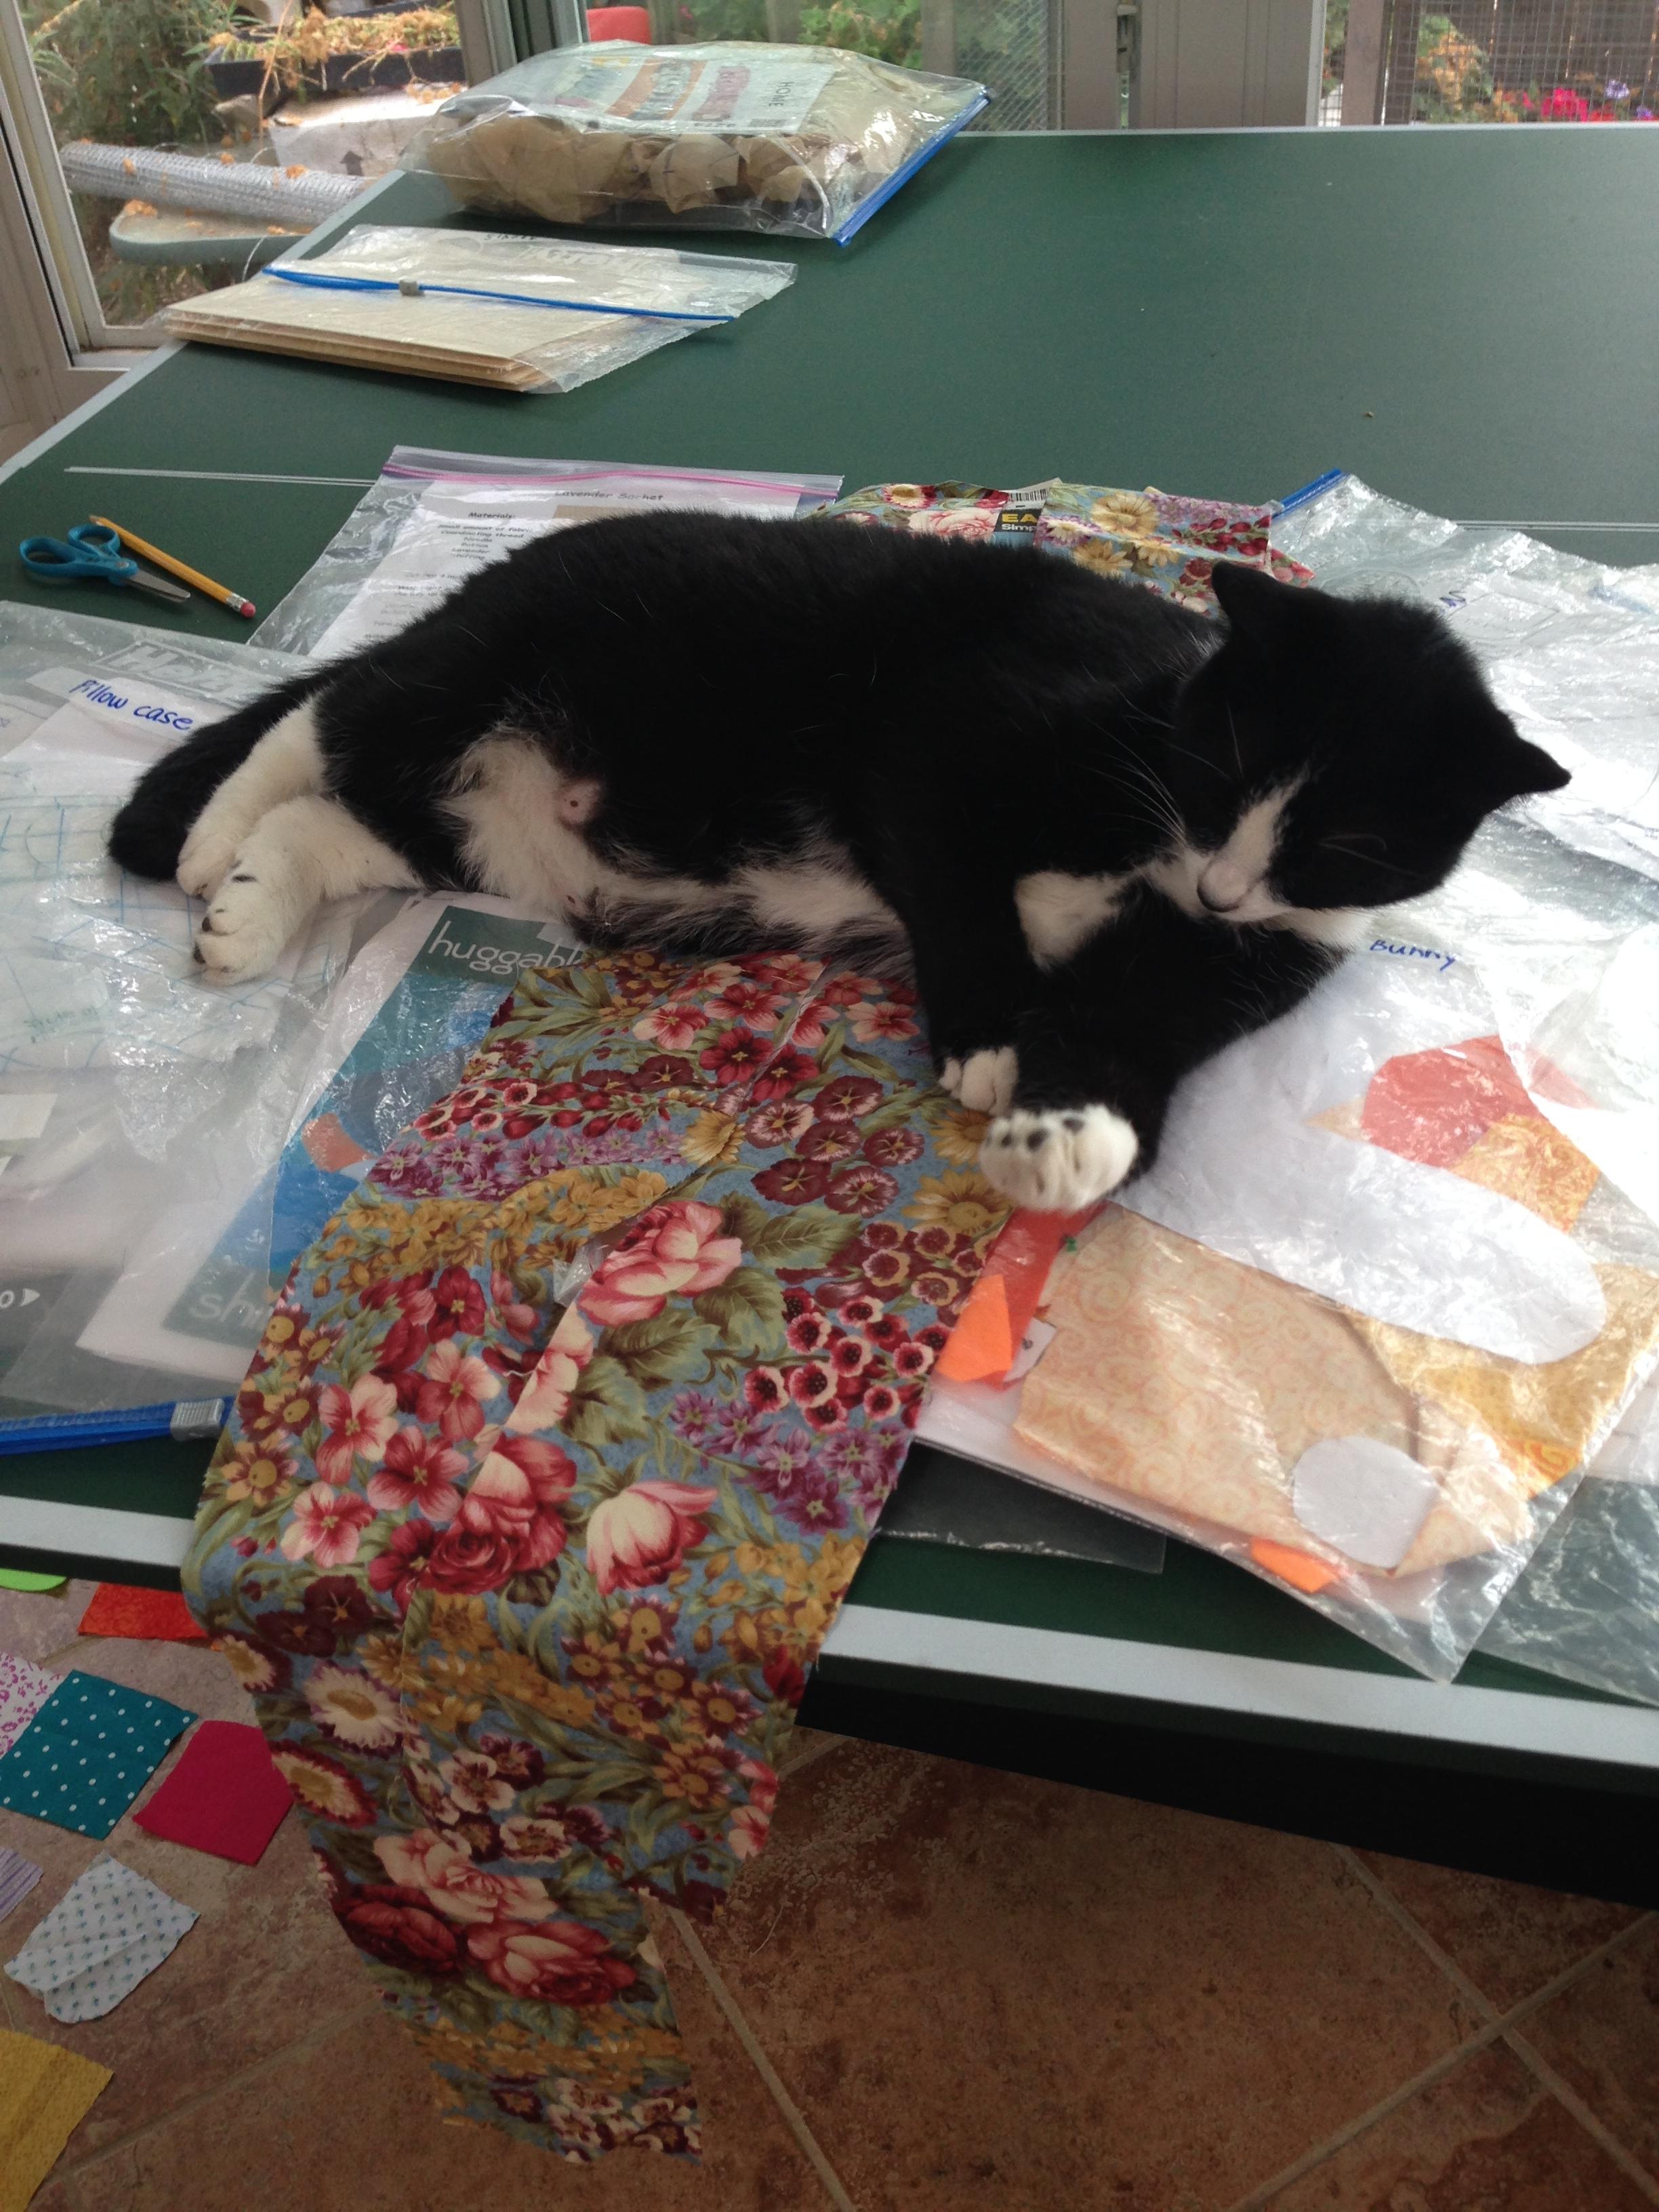 Tux napping on handbag straps.